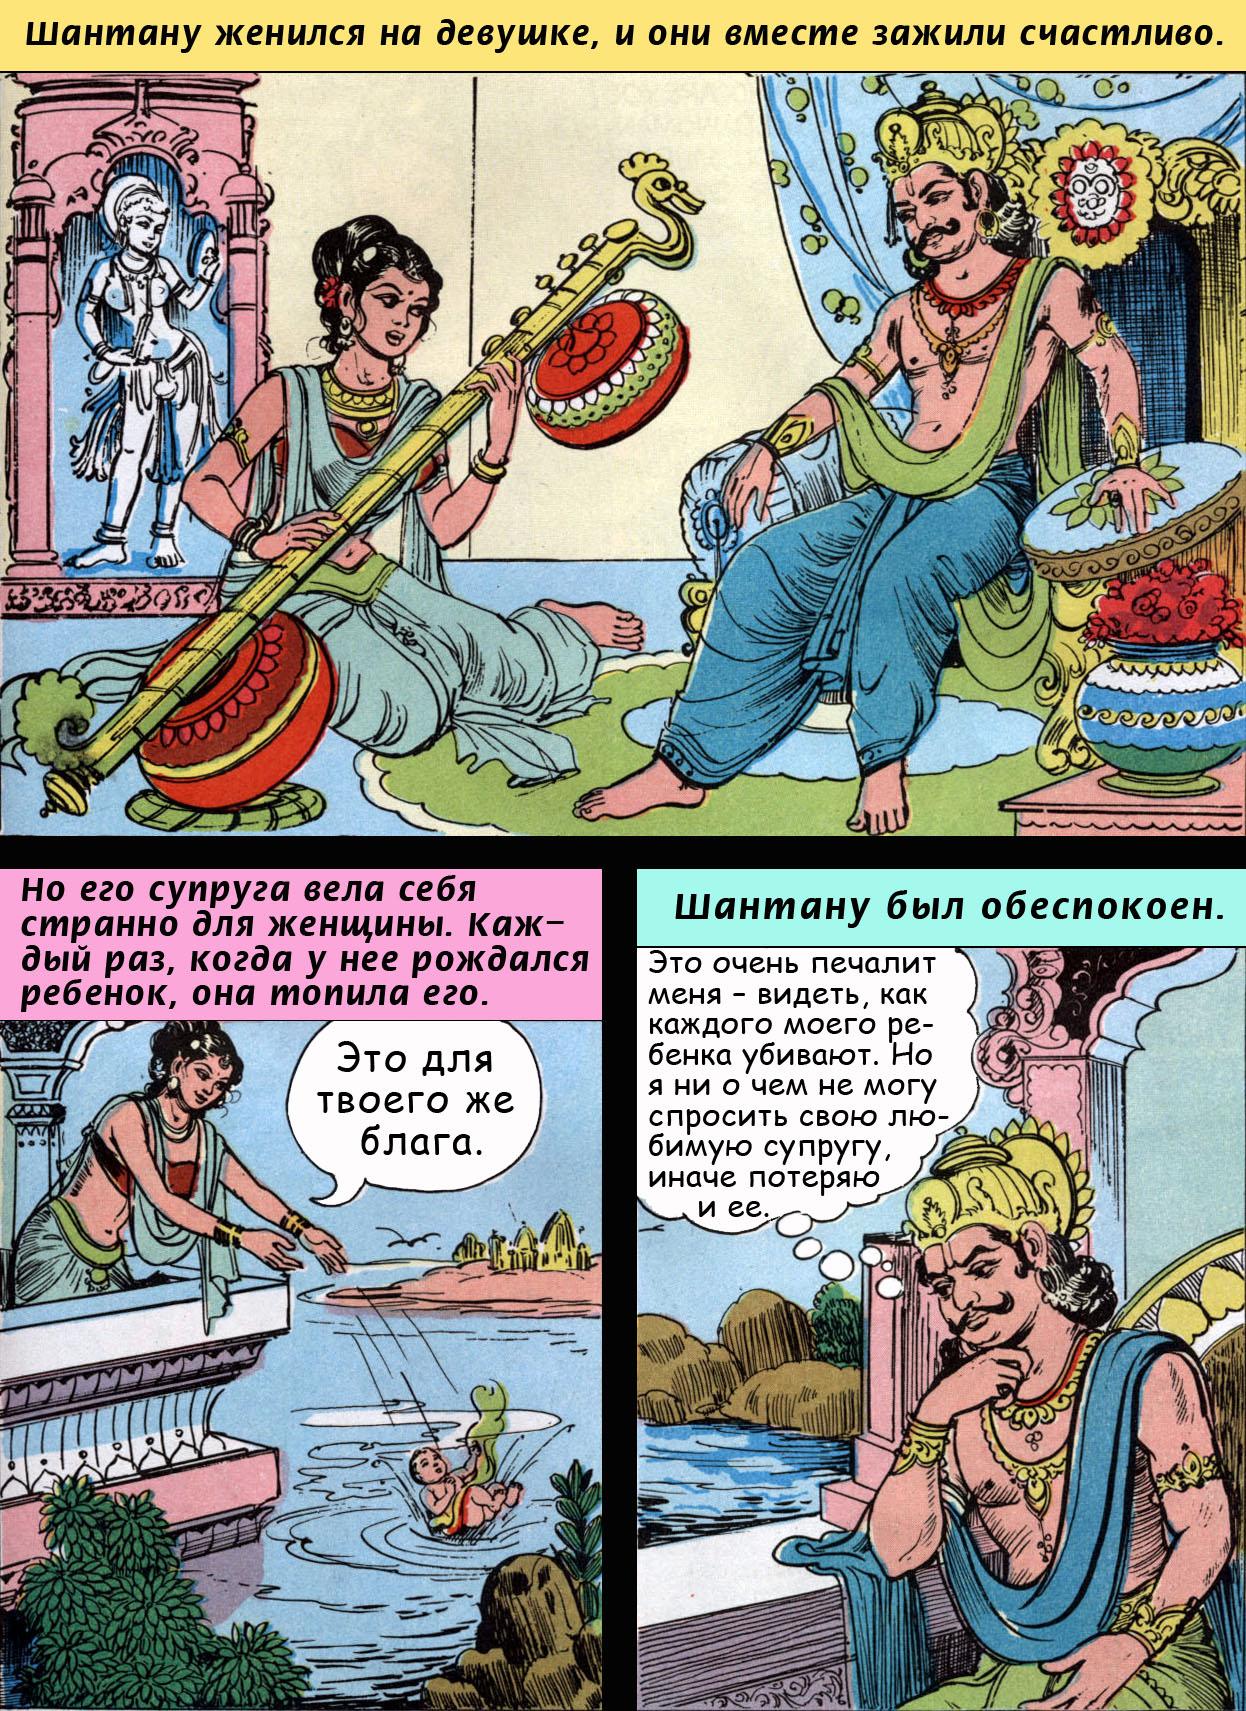 Бхишма 03 - ведический комикс